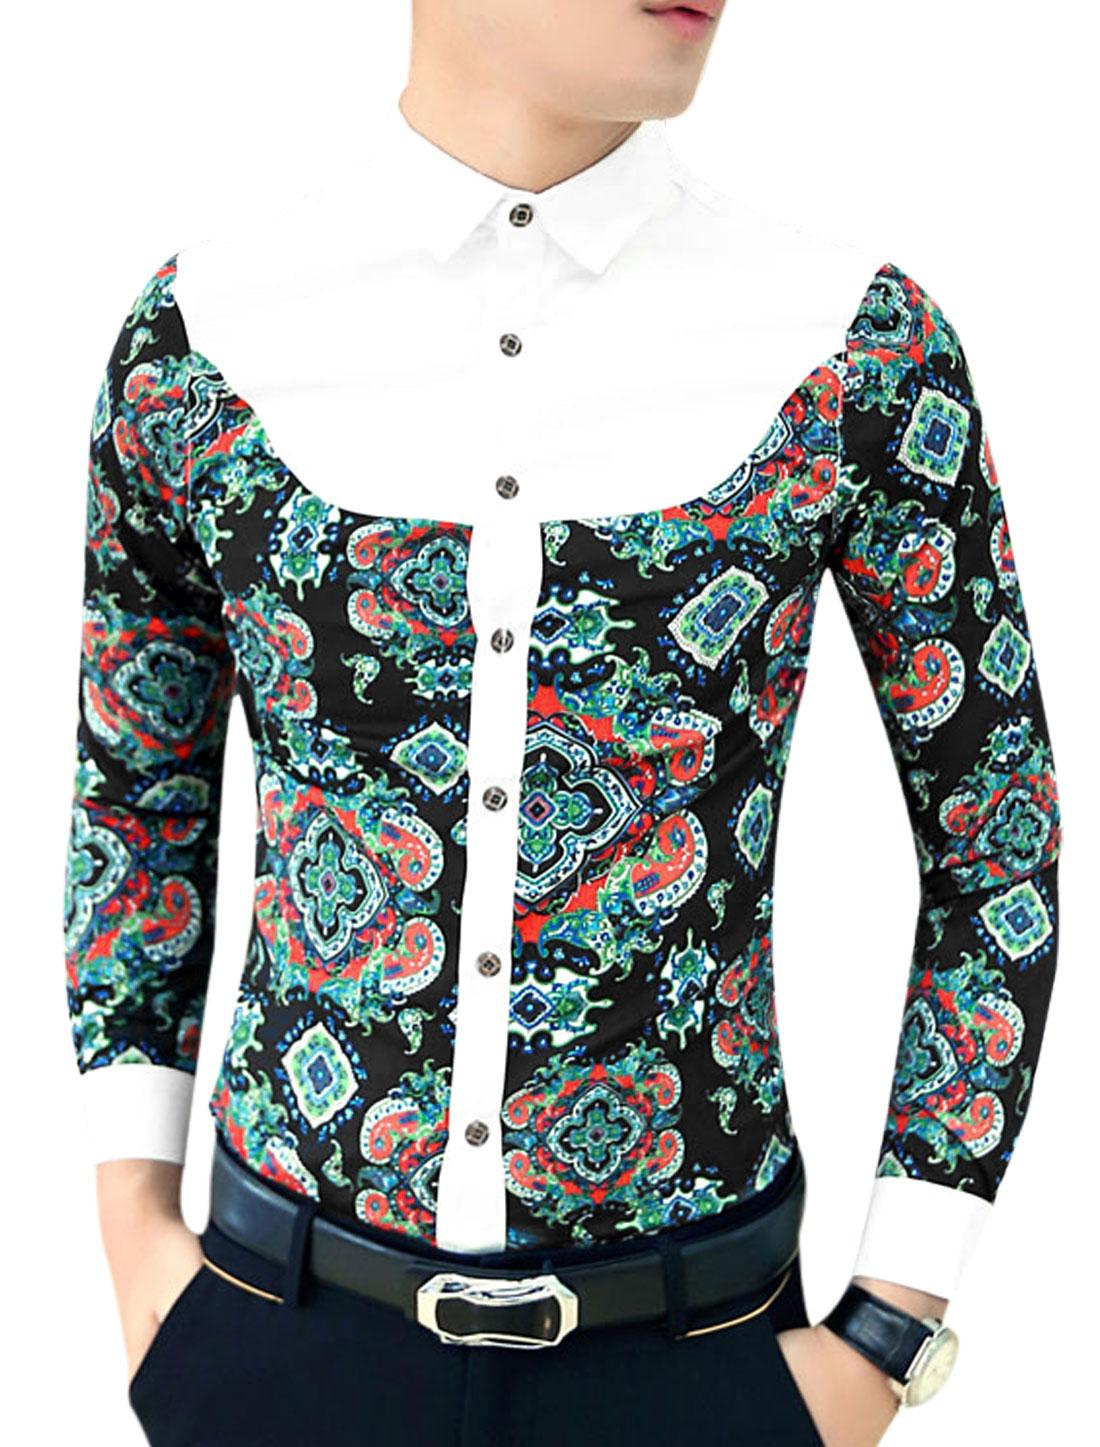 Men New Fashion Contrast Shoulder Contrast Jacquard Print Shirt White Orange M